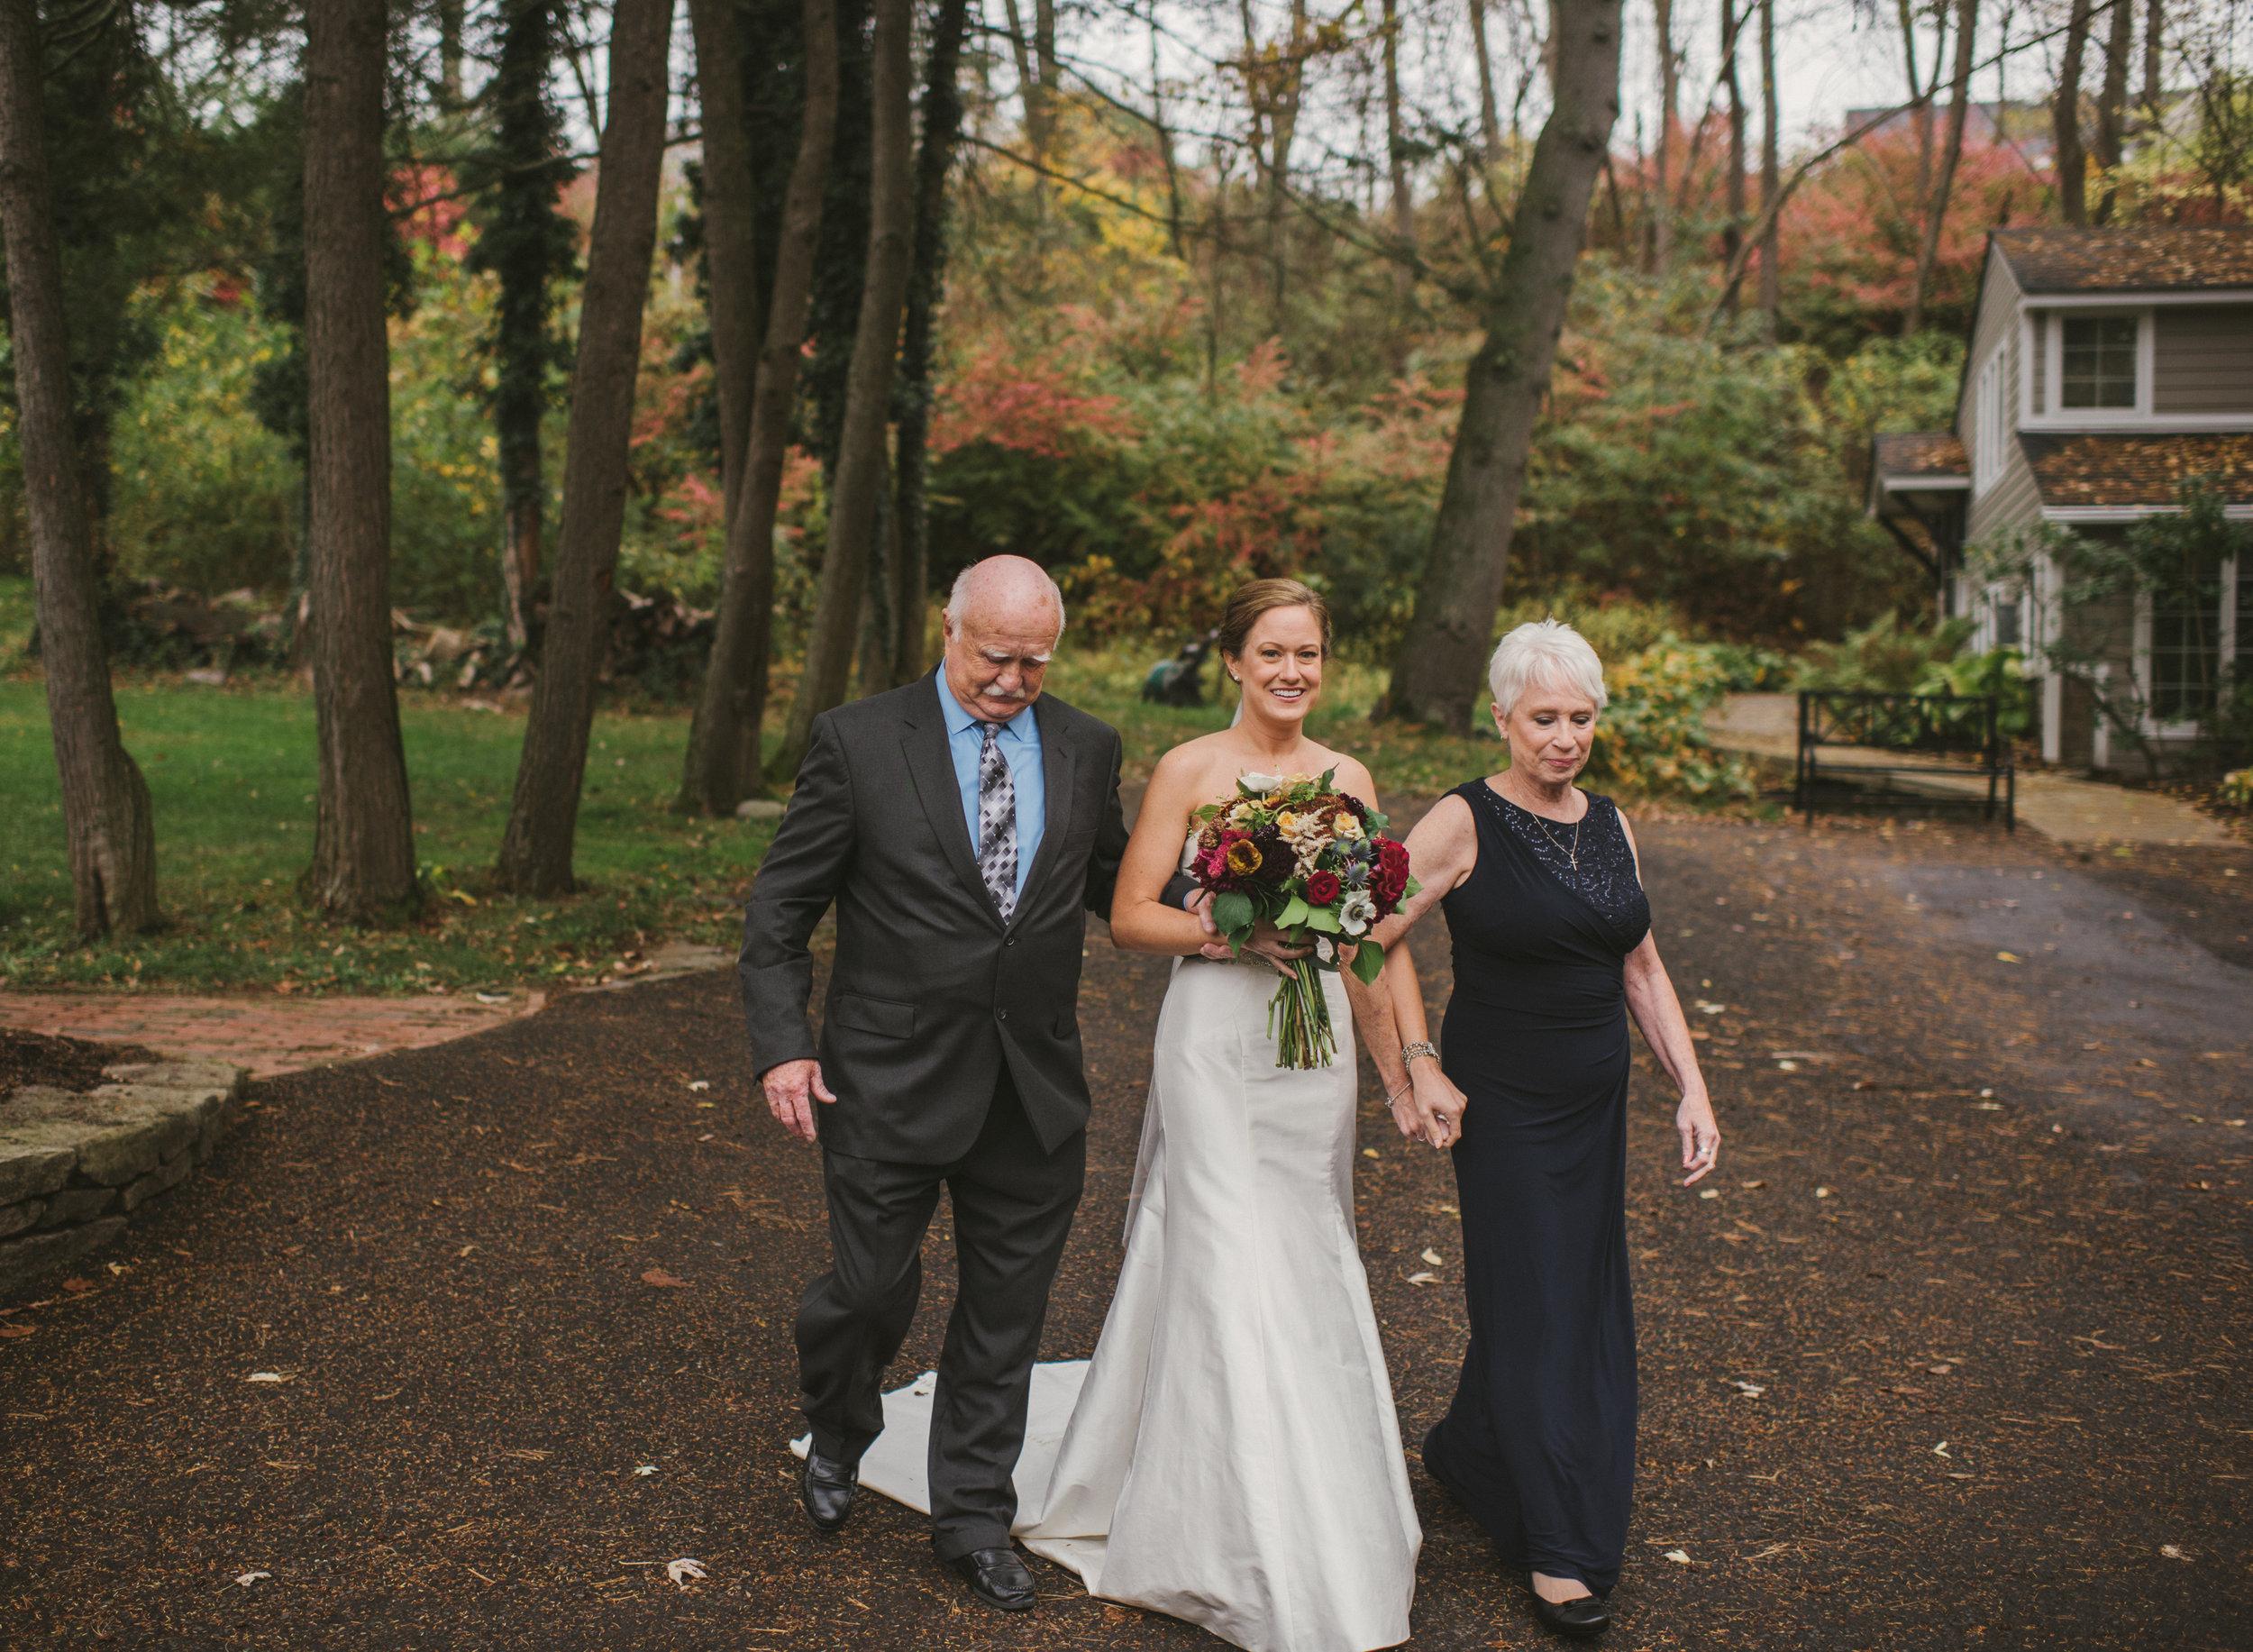 JACQUELINE & ANDREW WARSHAWER -BROOKMILL FARM FALL WEDDING - INTIMATE WEDDING PHOTOGRAPHER - TWOTWENTY by CHI-CHI AGBIM-211.jpg